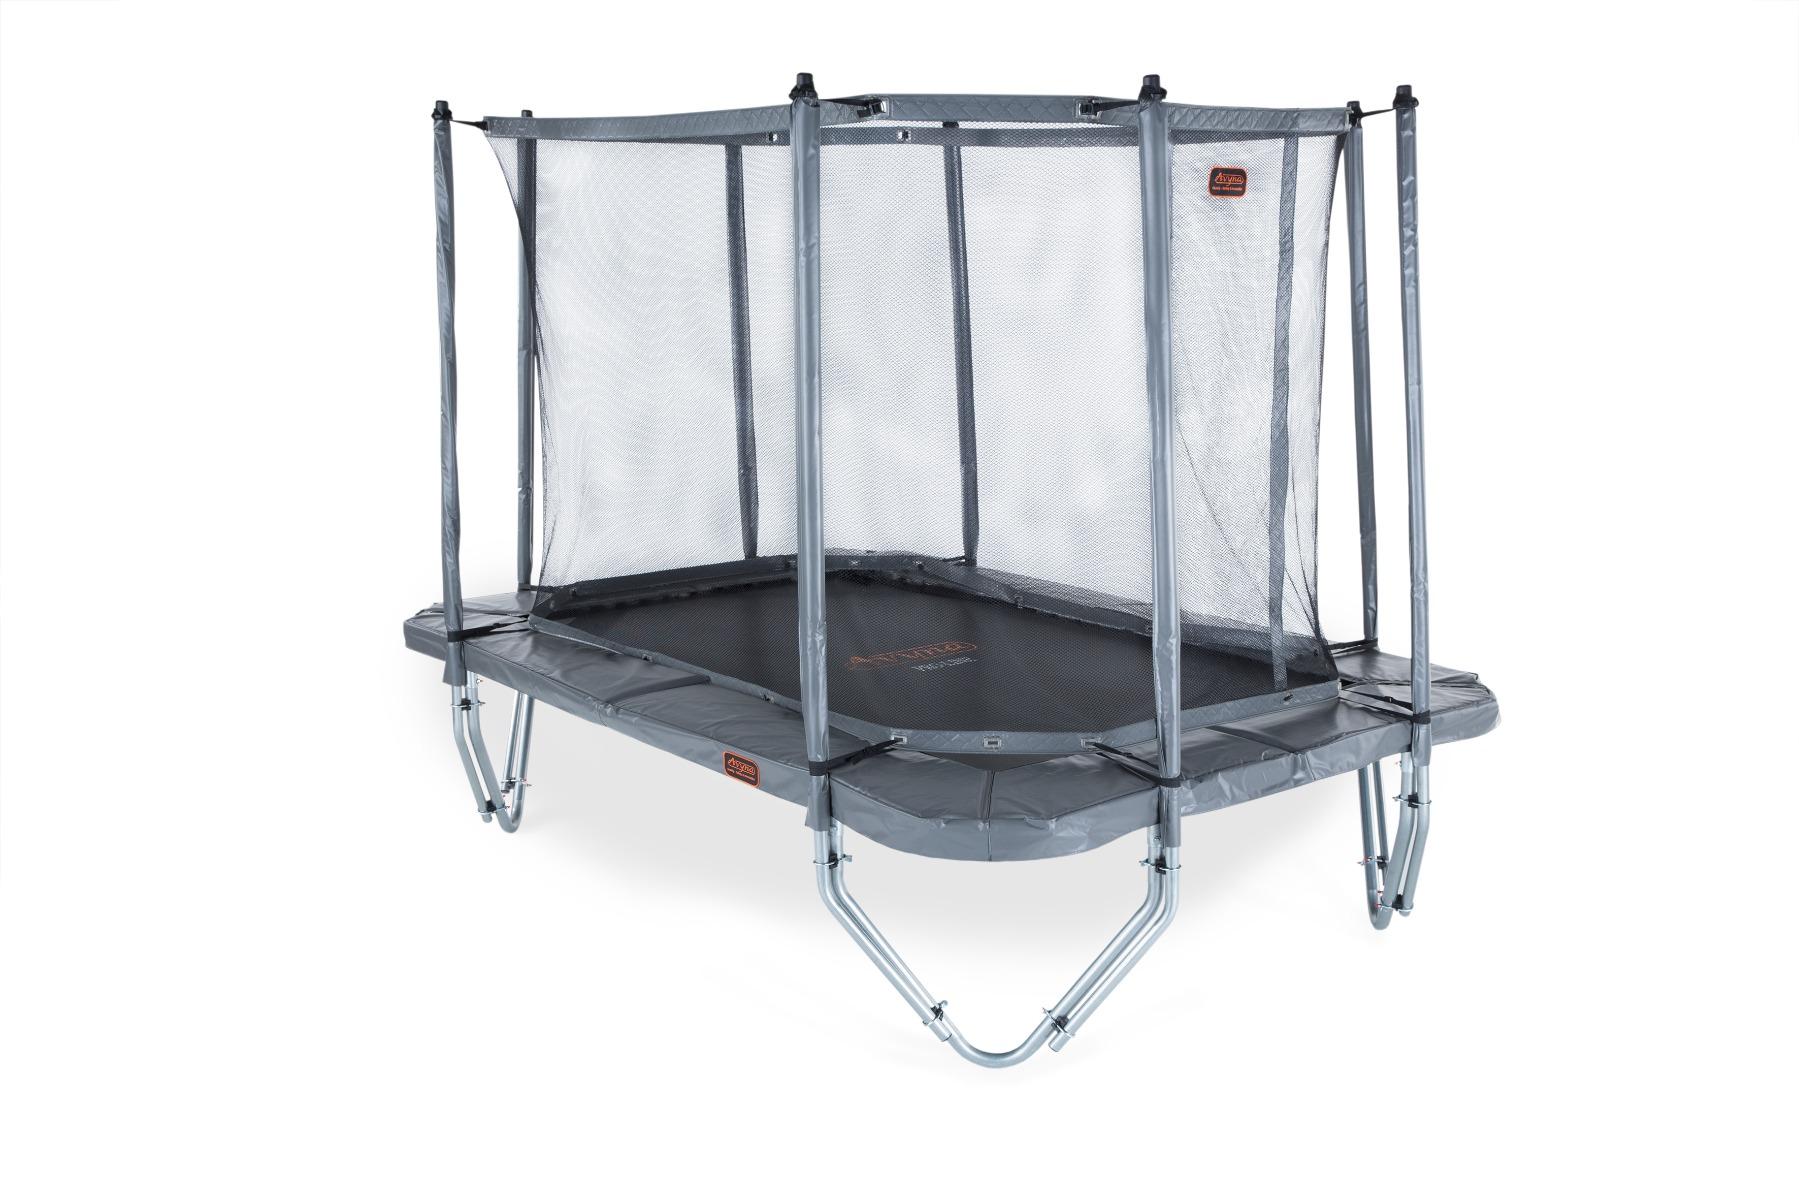 PRO-LINE trampoline 238